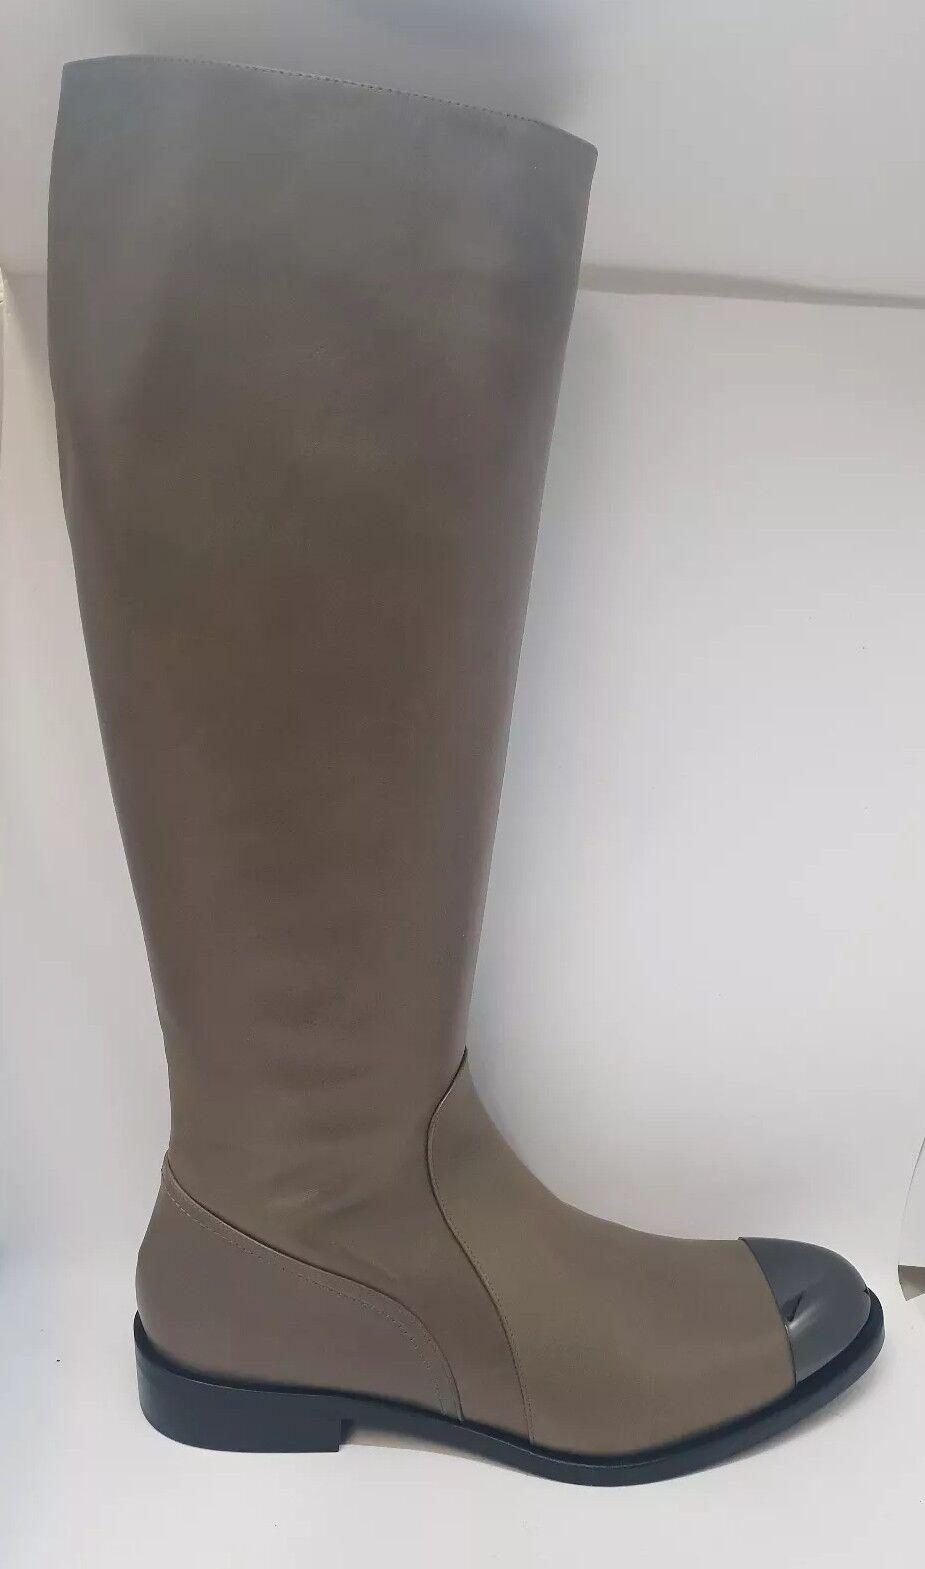 elementi di novità Madeleine Stivali da donna donna donna lungo GAMBALE STIVALI PELLE GRIGIO uk8 tg. 42 neu&ovp  marca